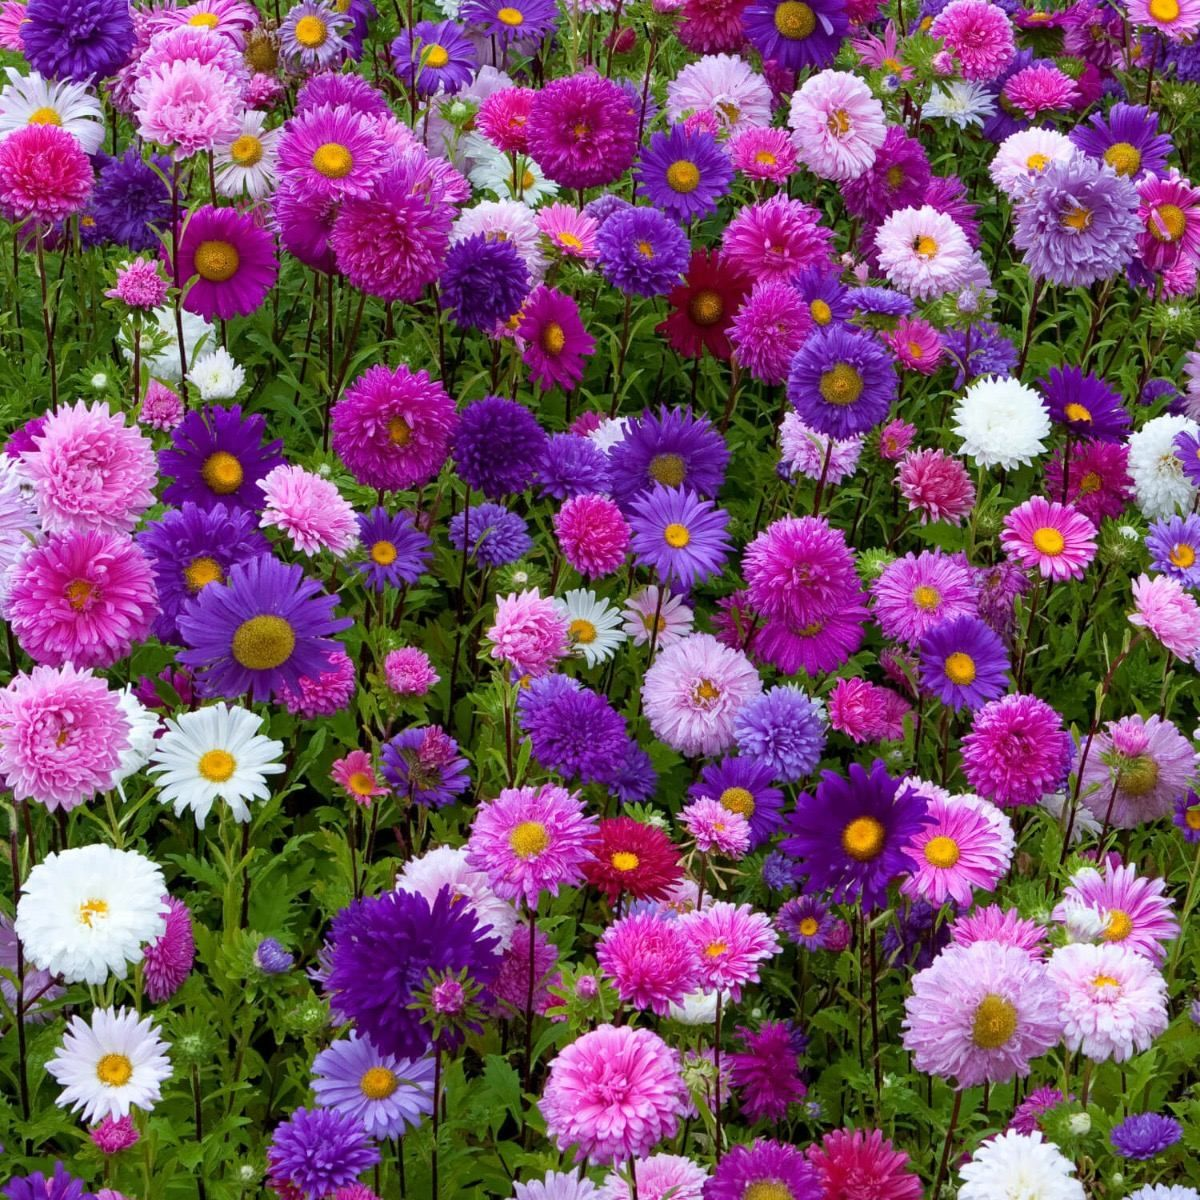 Aster De China O Reina Margarita Callistephus Chinensis In 2020 Aster Flower Flower Farm Flower Seeds